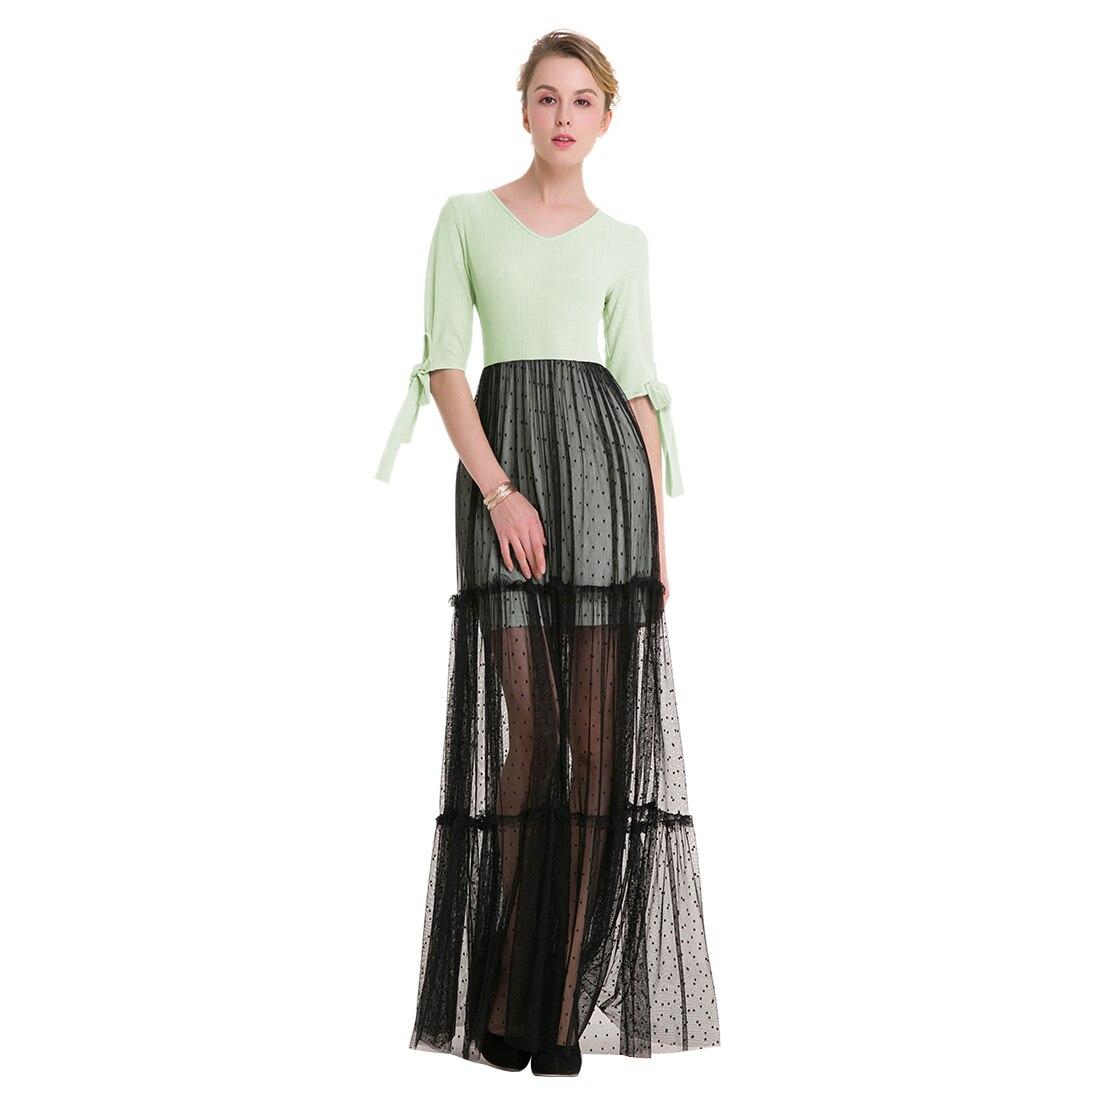 TFGS Original Design Women Elegant Lace Dress Patchwork Lace Dot V Neck Half Sleeve Ankle Length